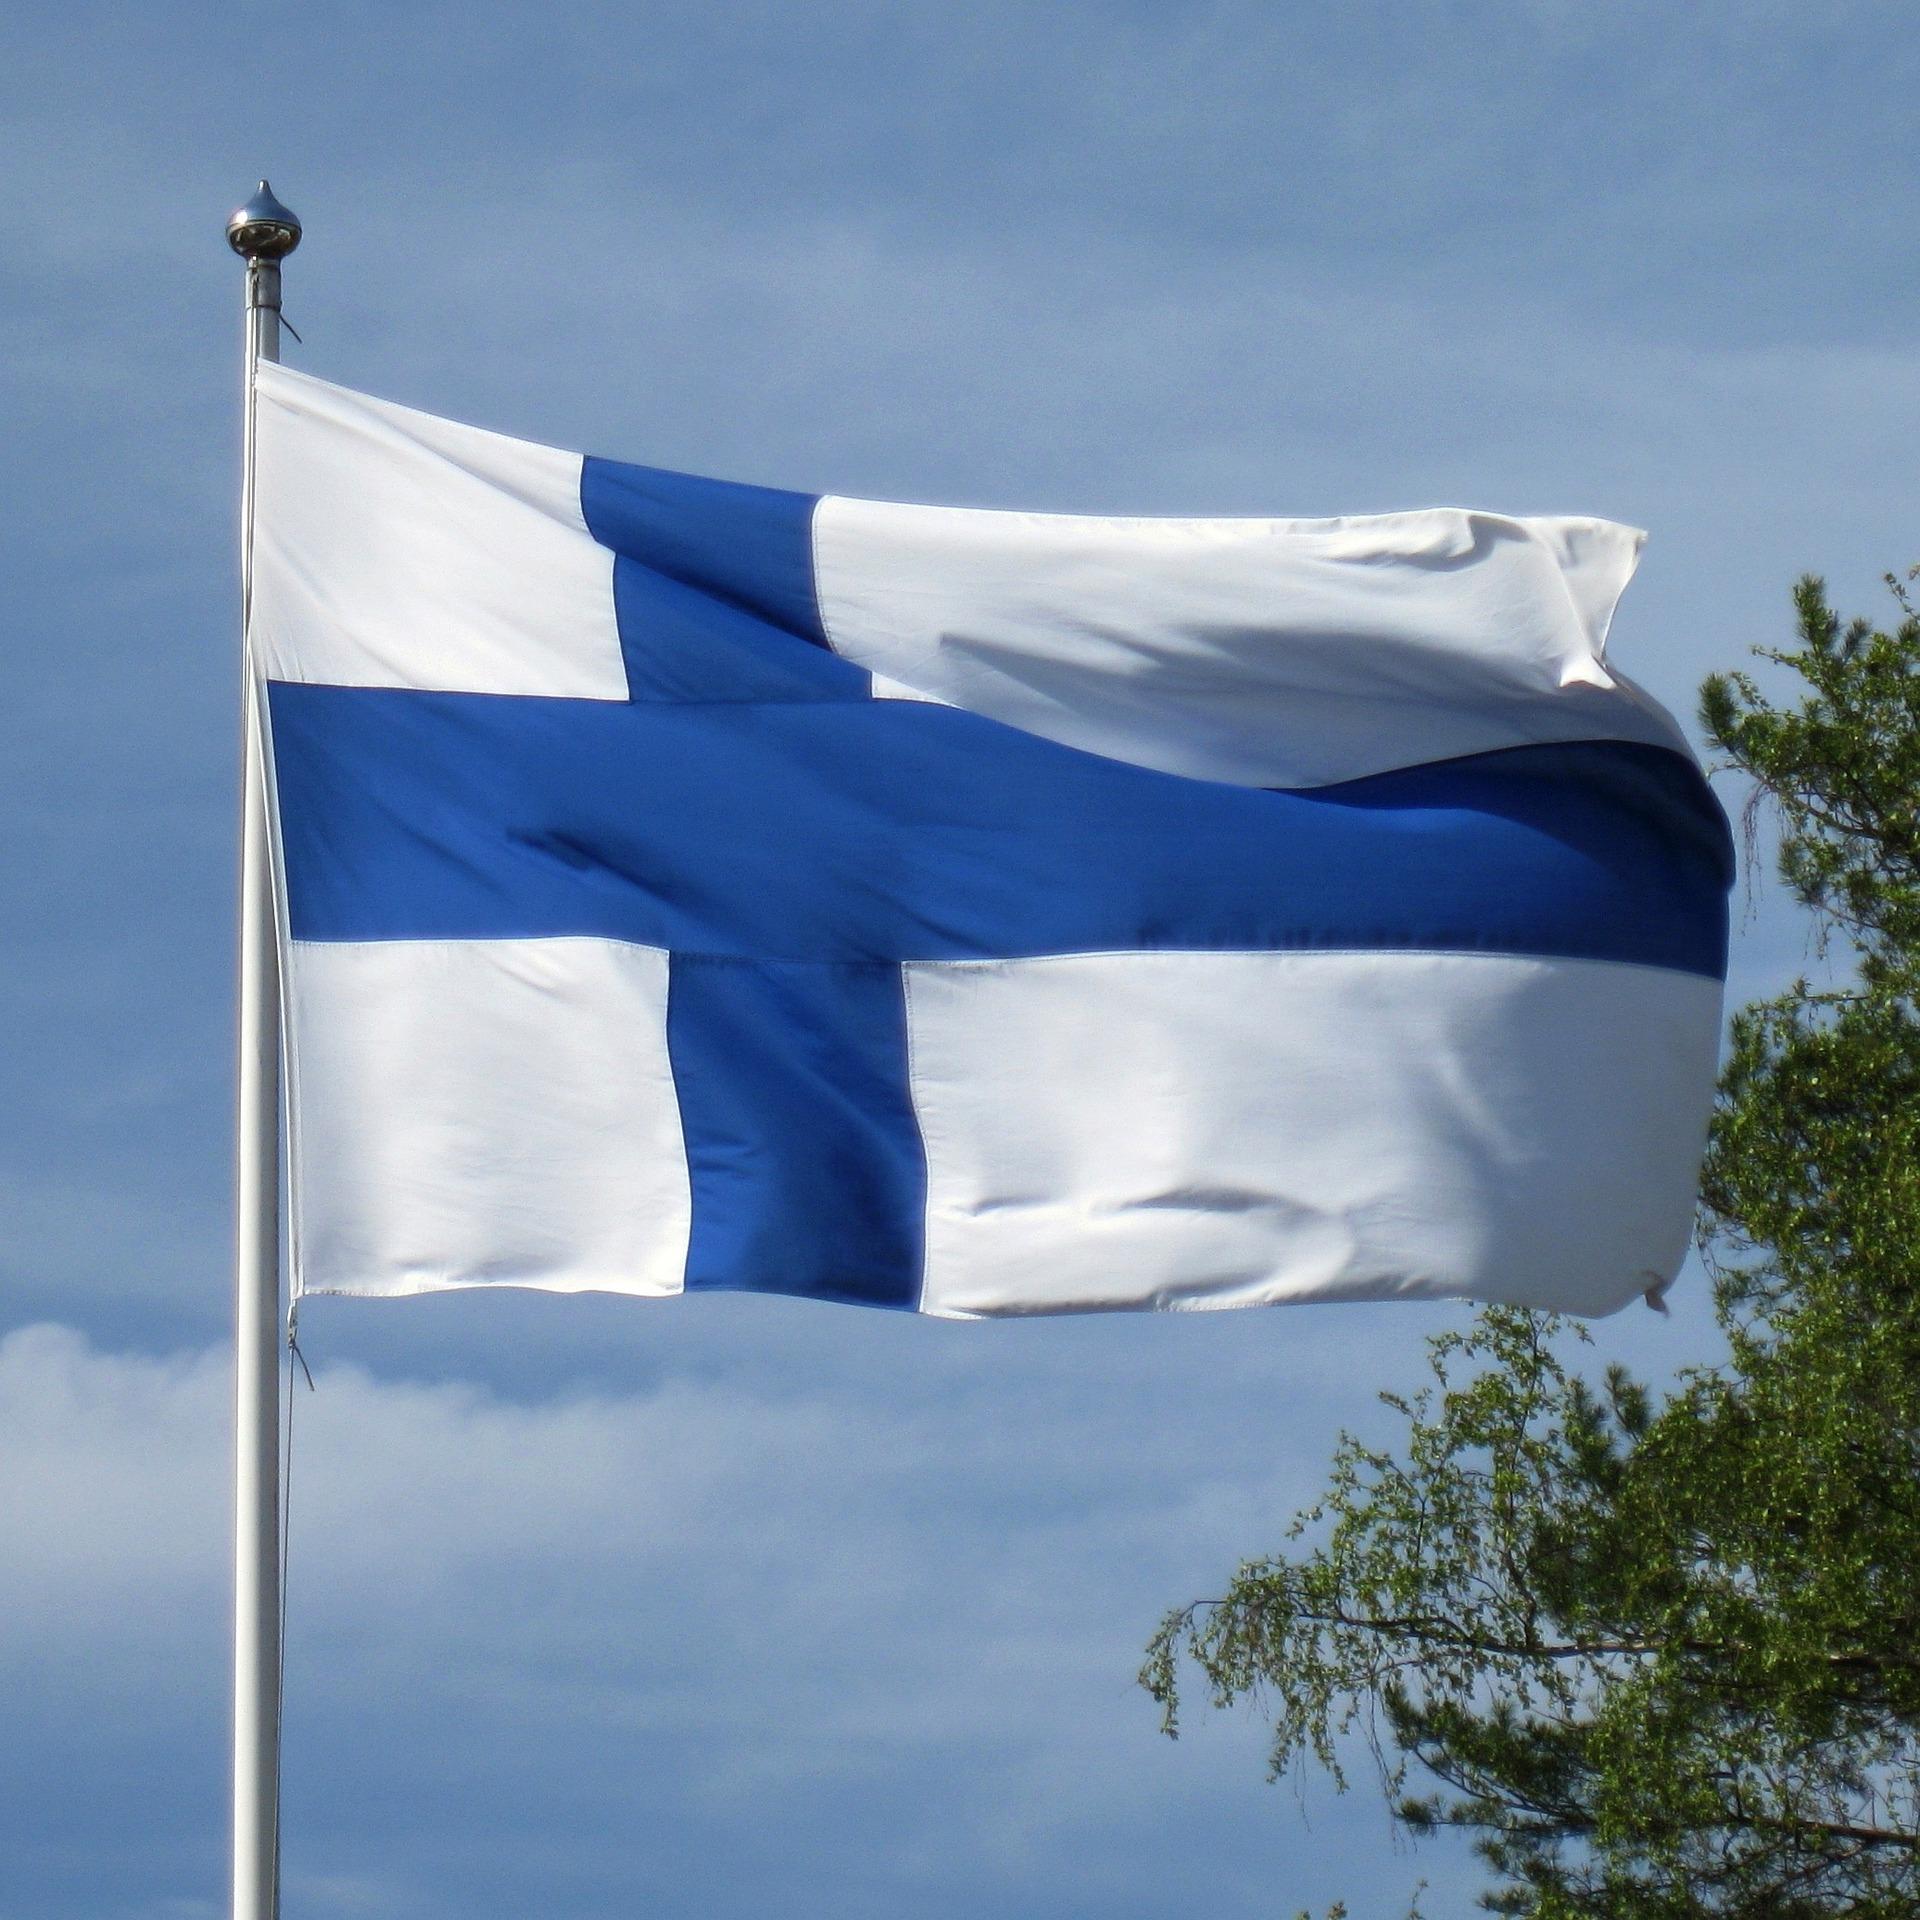 Suomen lippu. Pixabay.